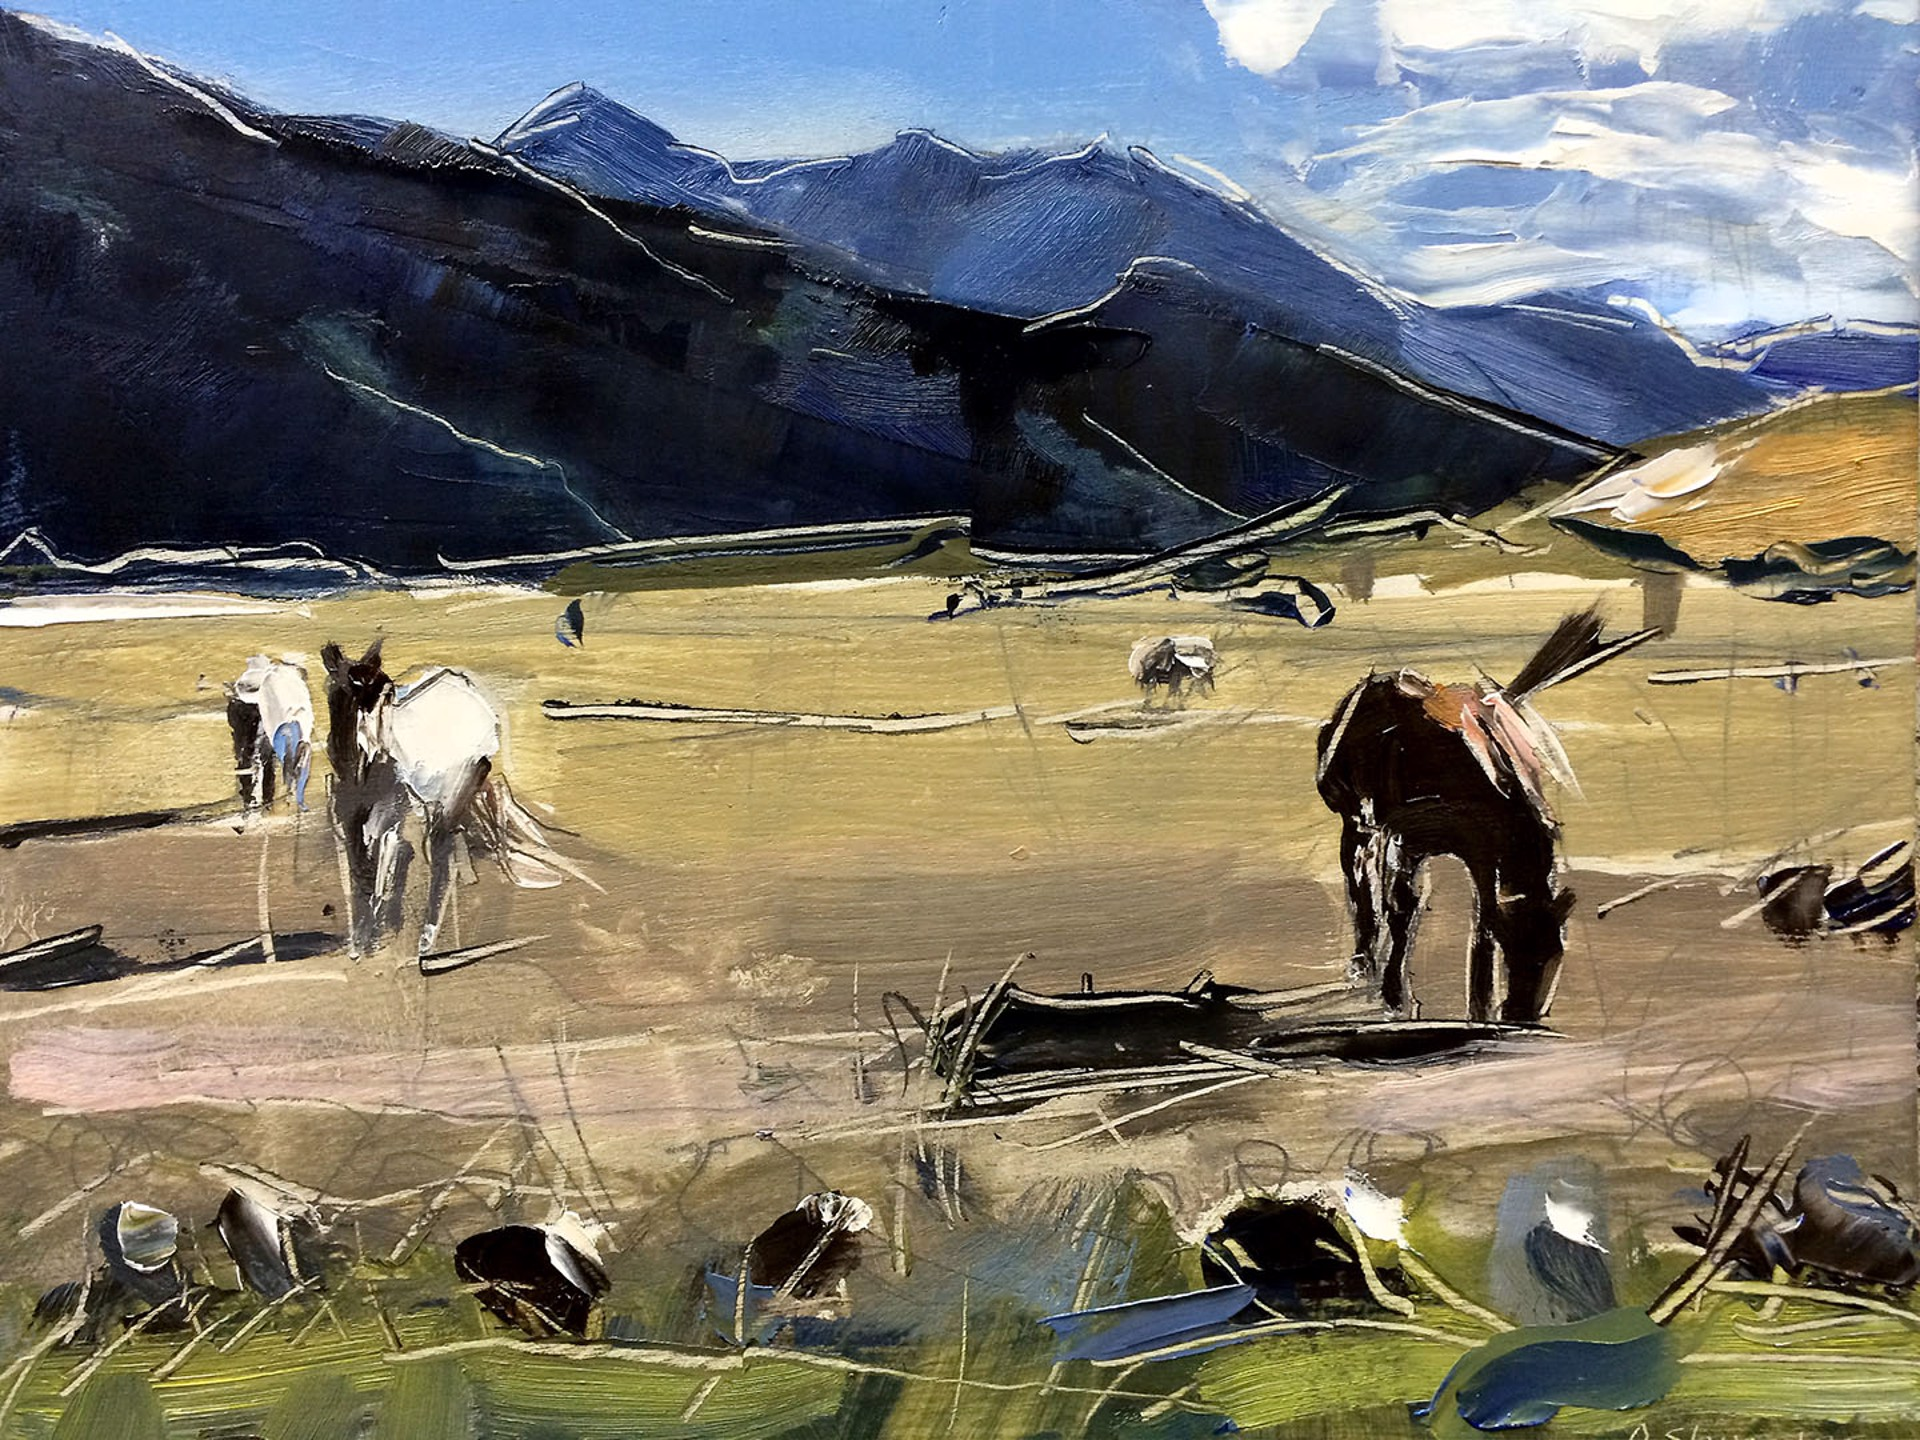 Horses in Montana by David Shingler